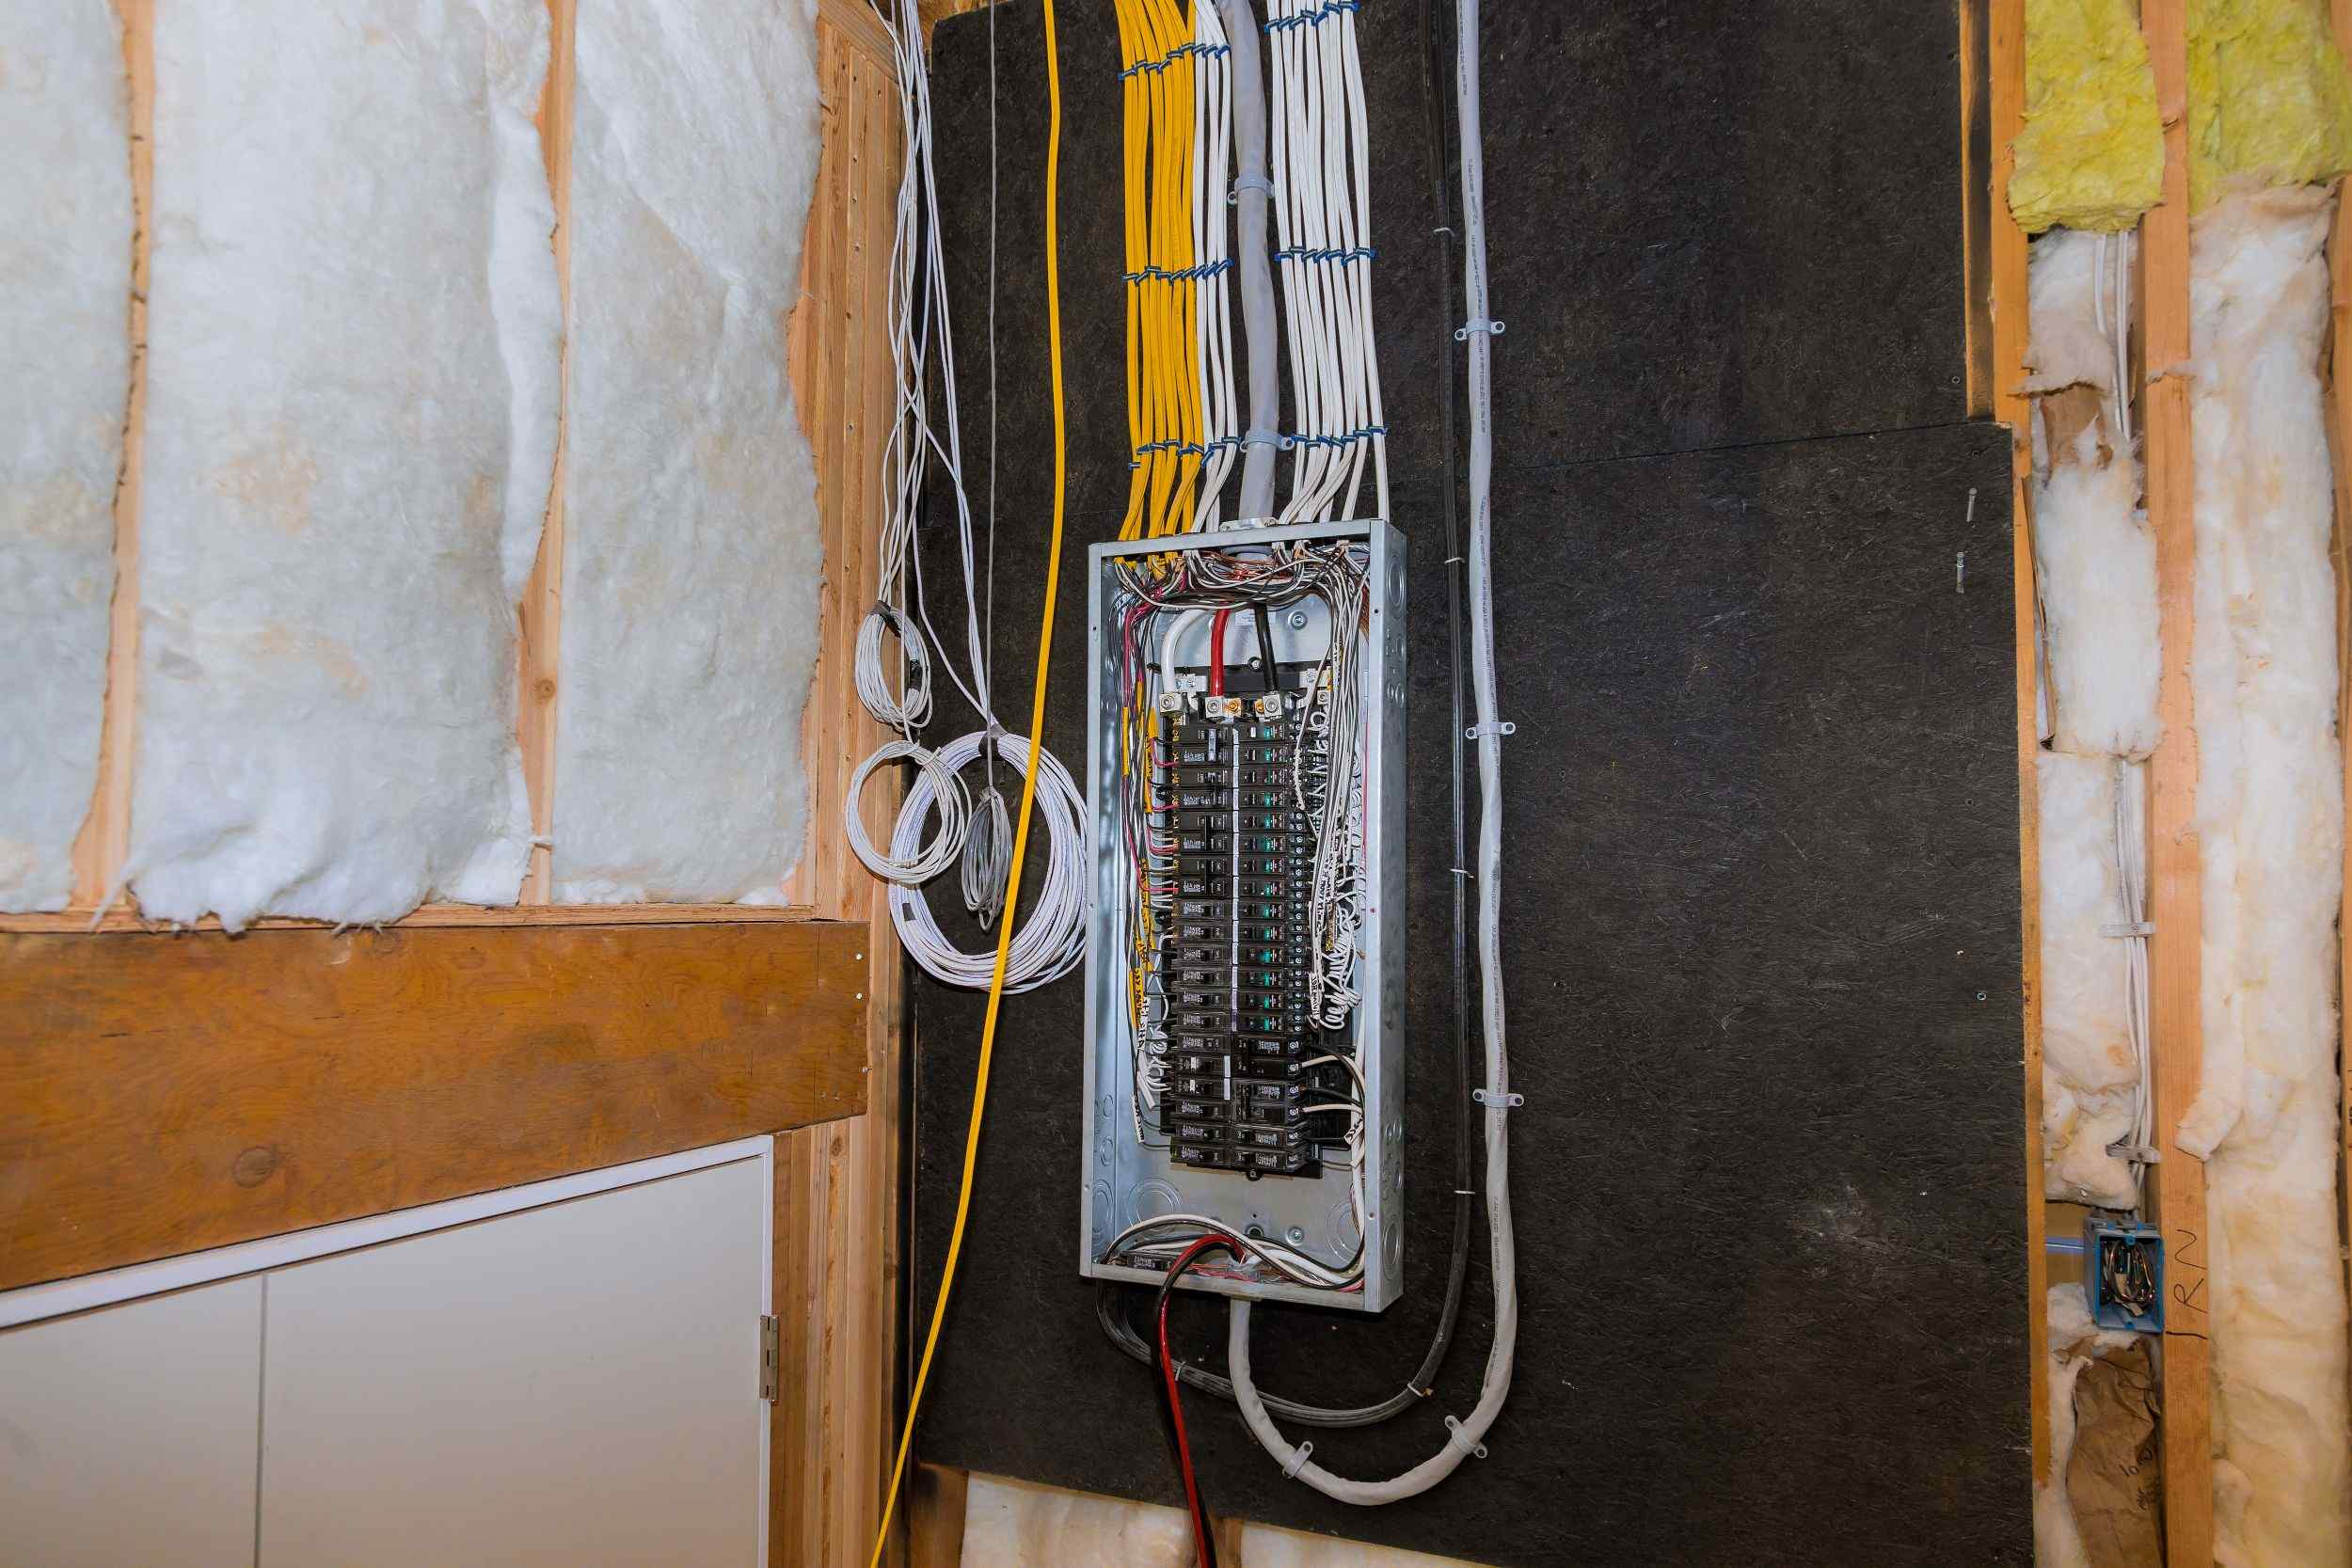 Electricians in Fairfax Station VA